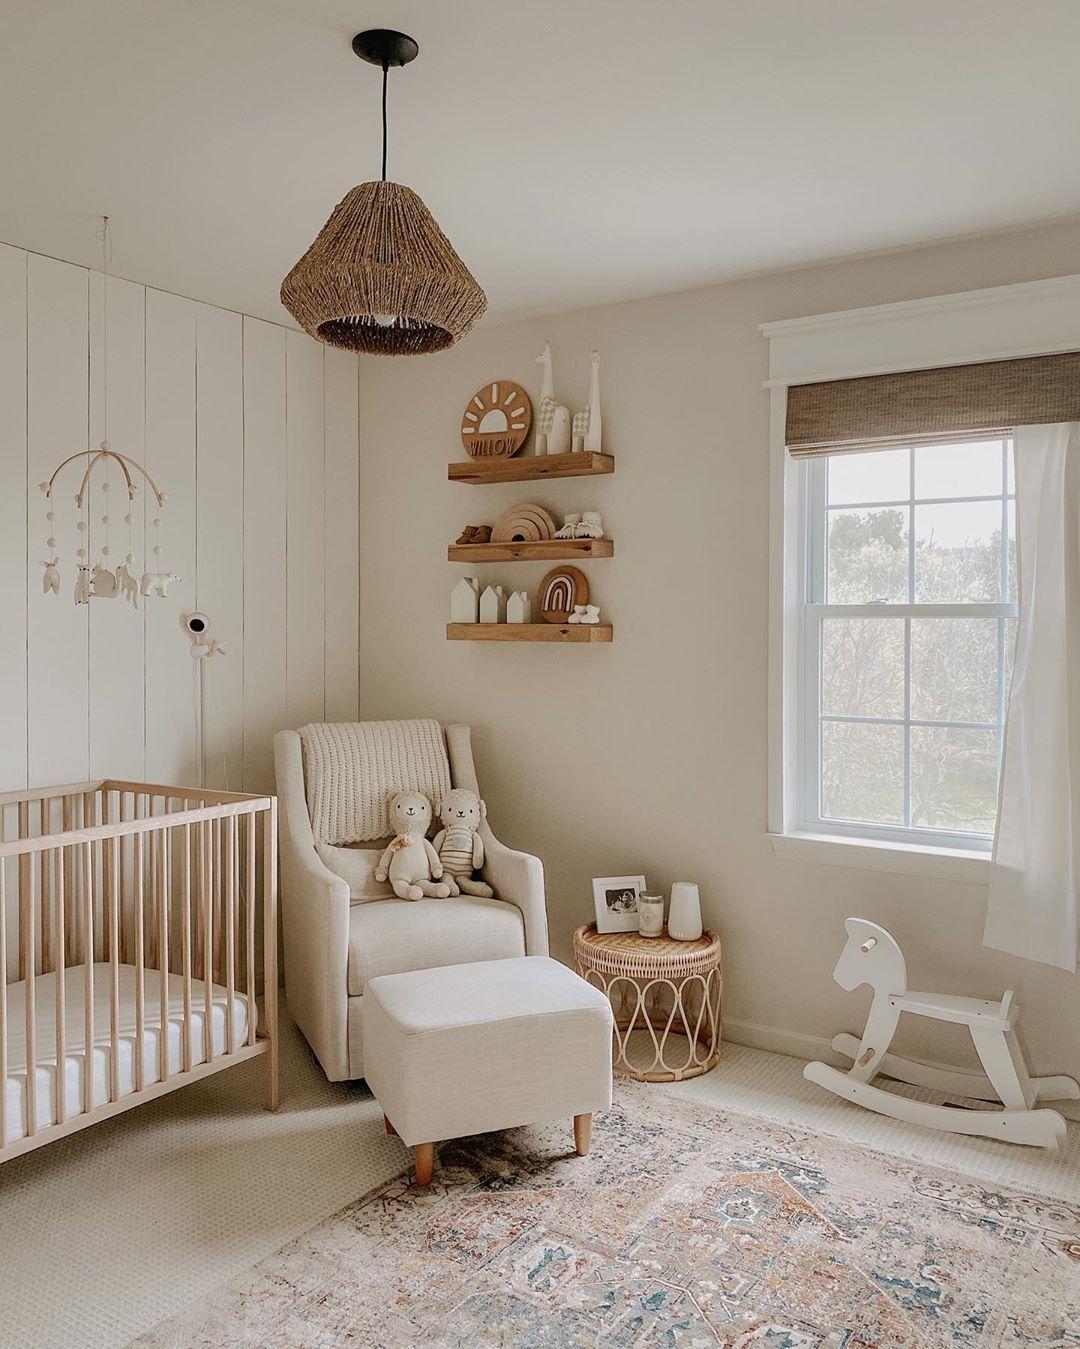 18 Neutral Modern Nursery Ideas for your Baby Room